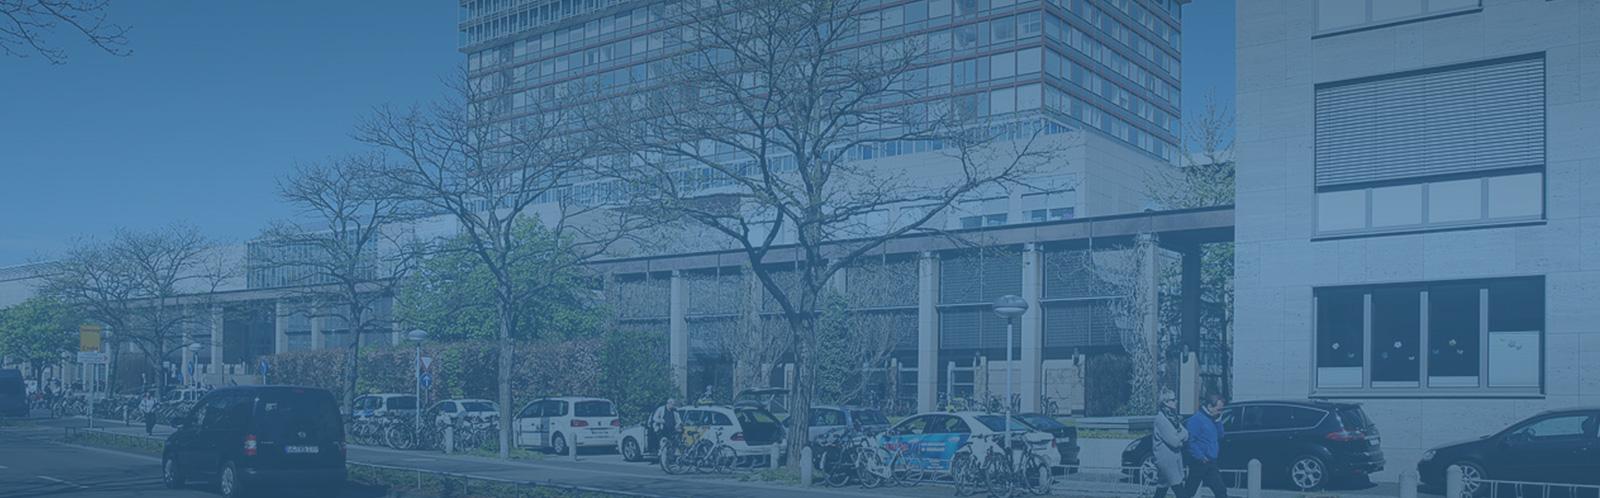 Köln Uniklinik Köln Bettenhaus